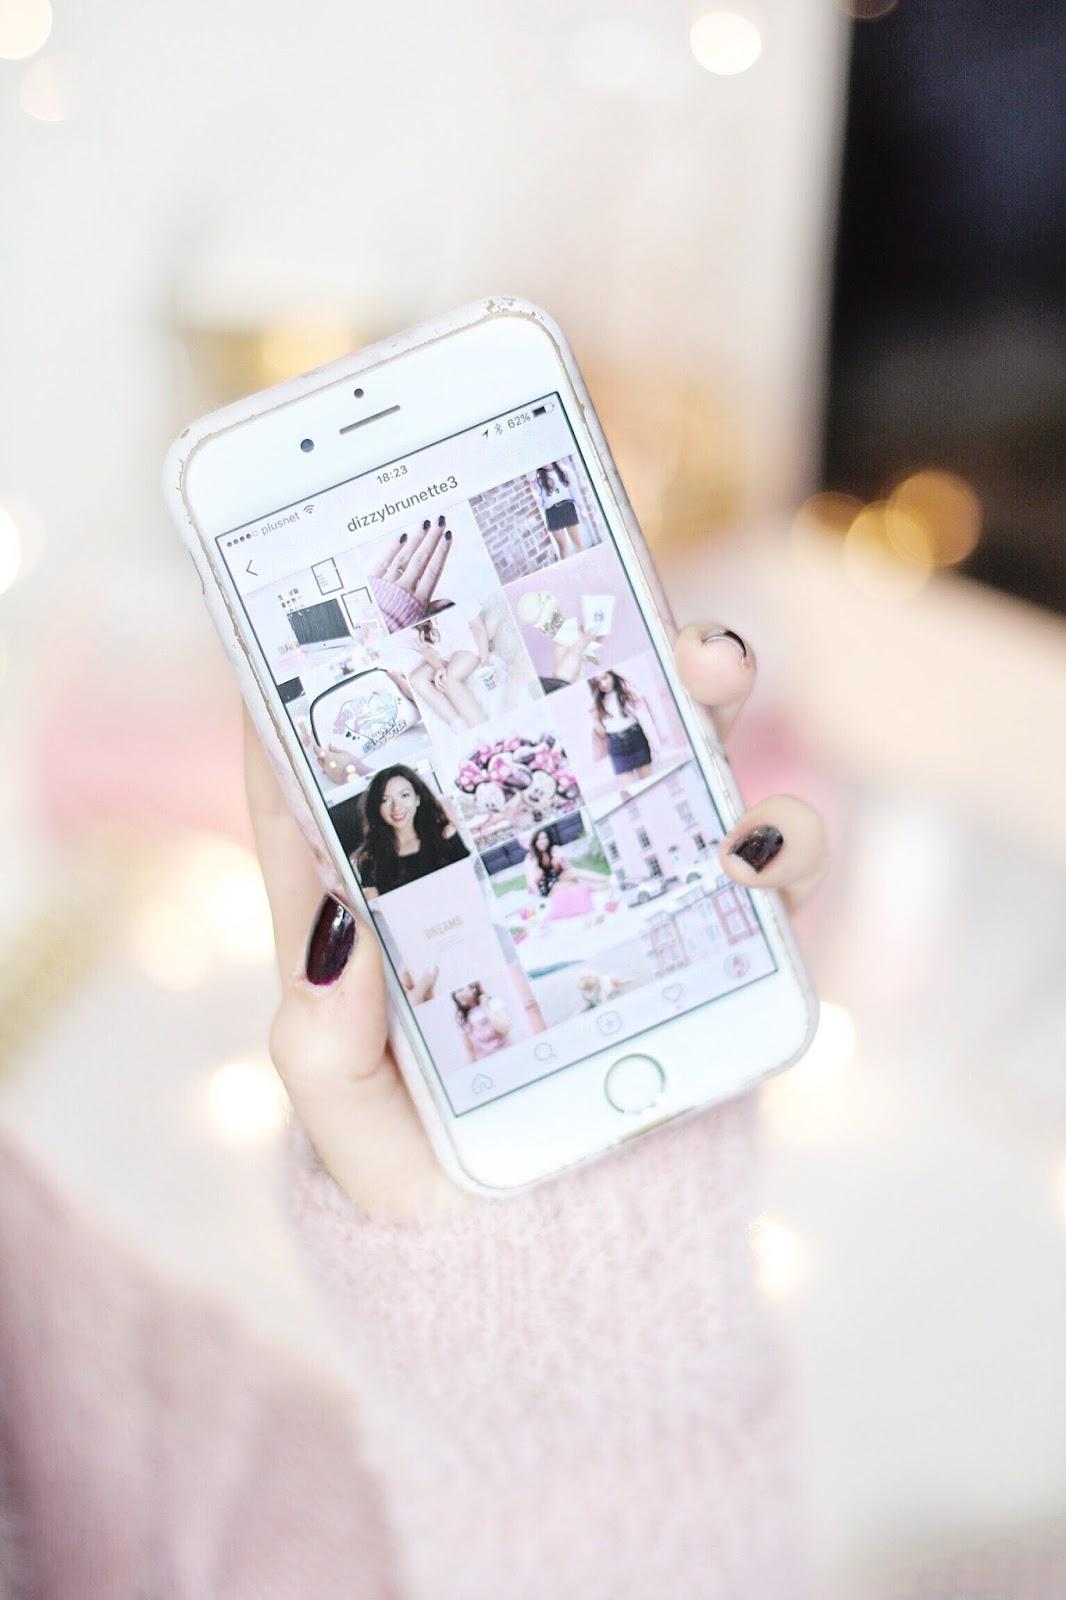 5 Ways To Help Grow Your Instagram, Instagram, social media, photography, how to get more instagram followers, blogging, dizzybrunette3 instagram